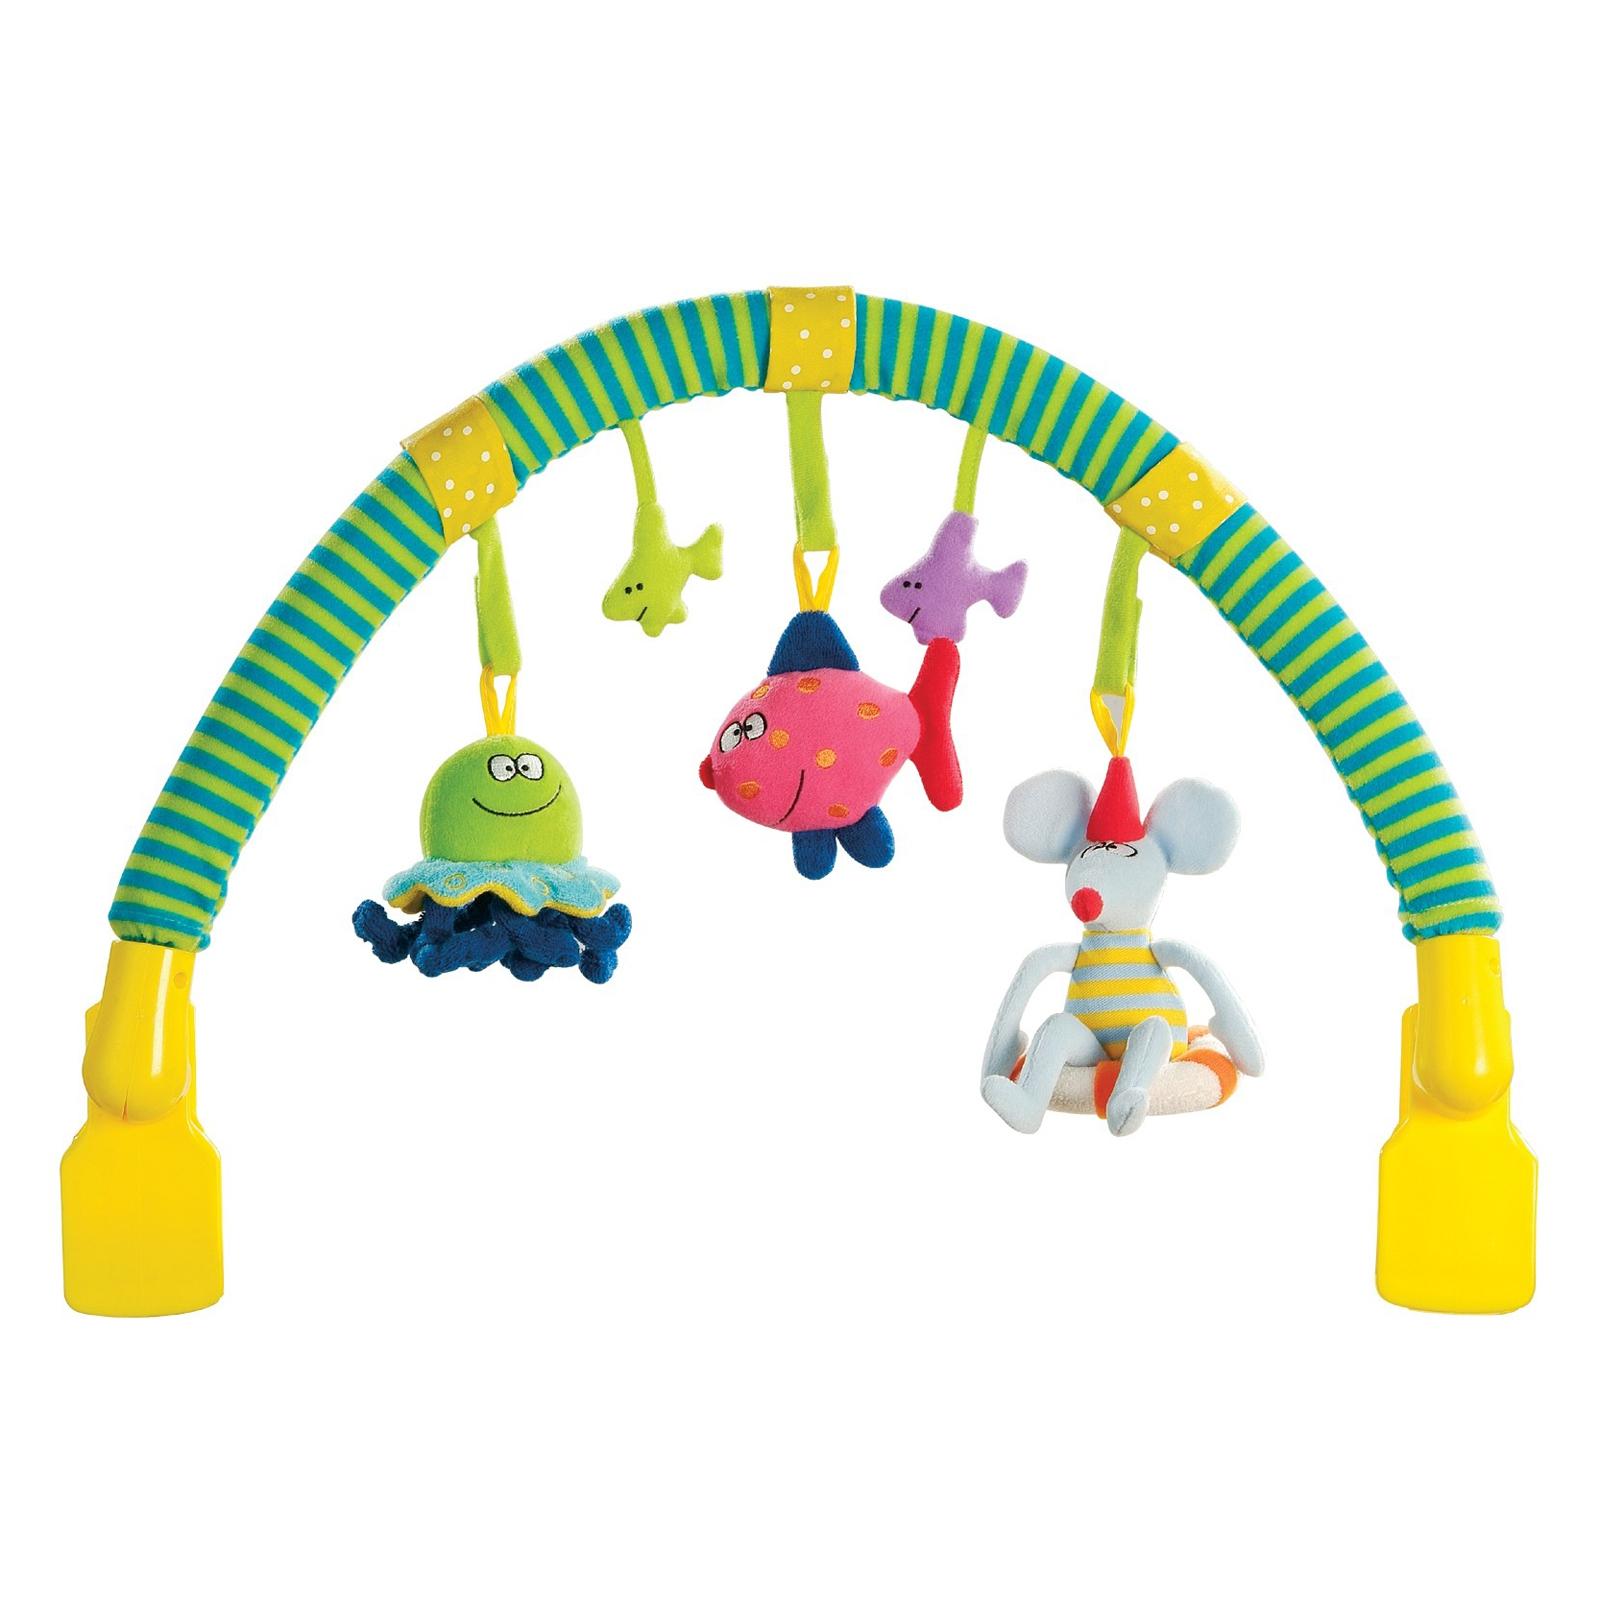 ���� ����������� Taf Toys � ���������� � 0 ���. (10565)